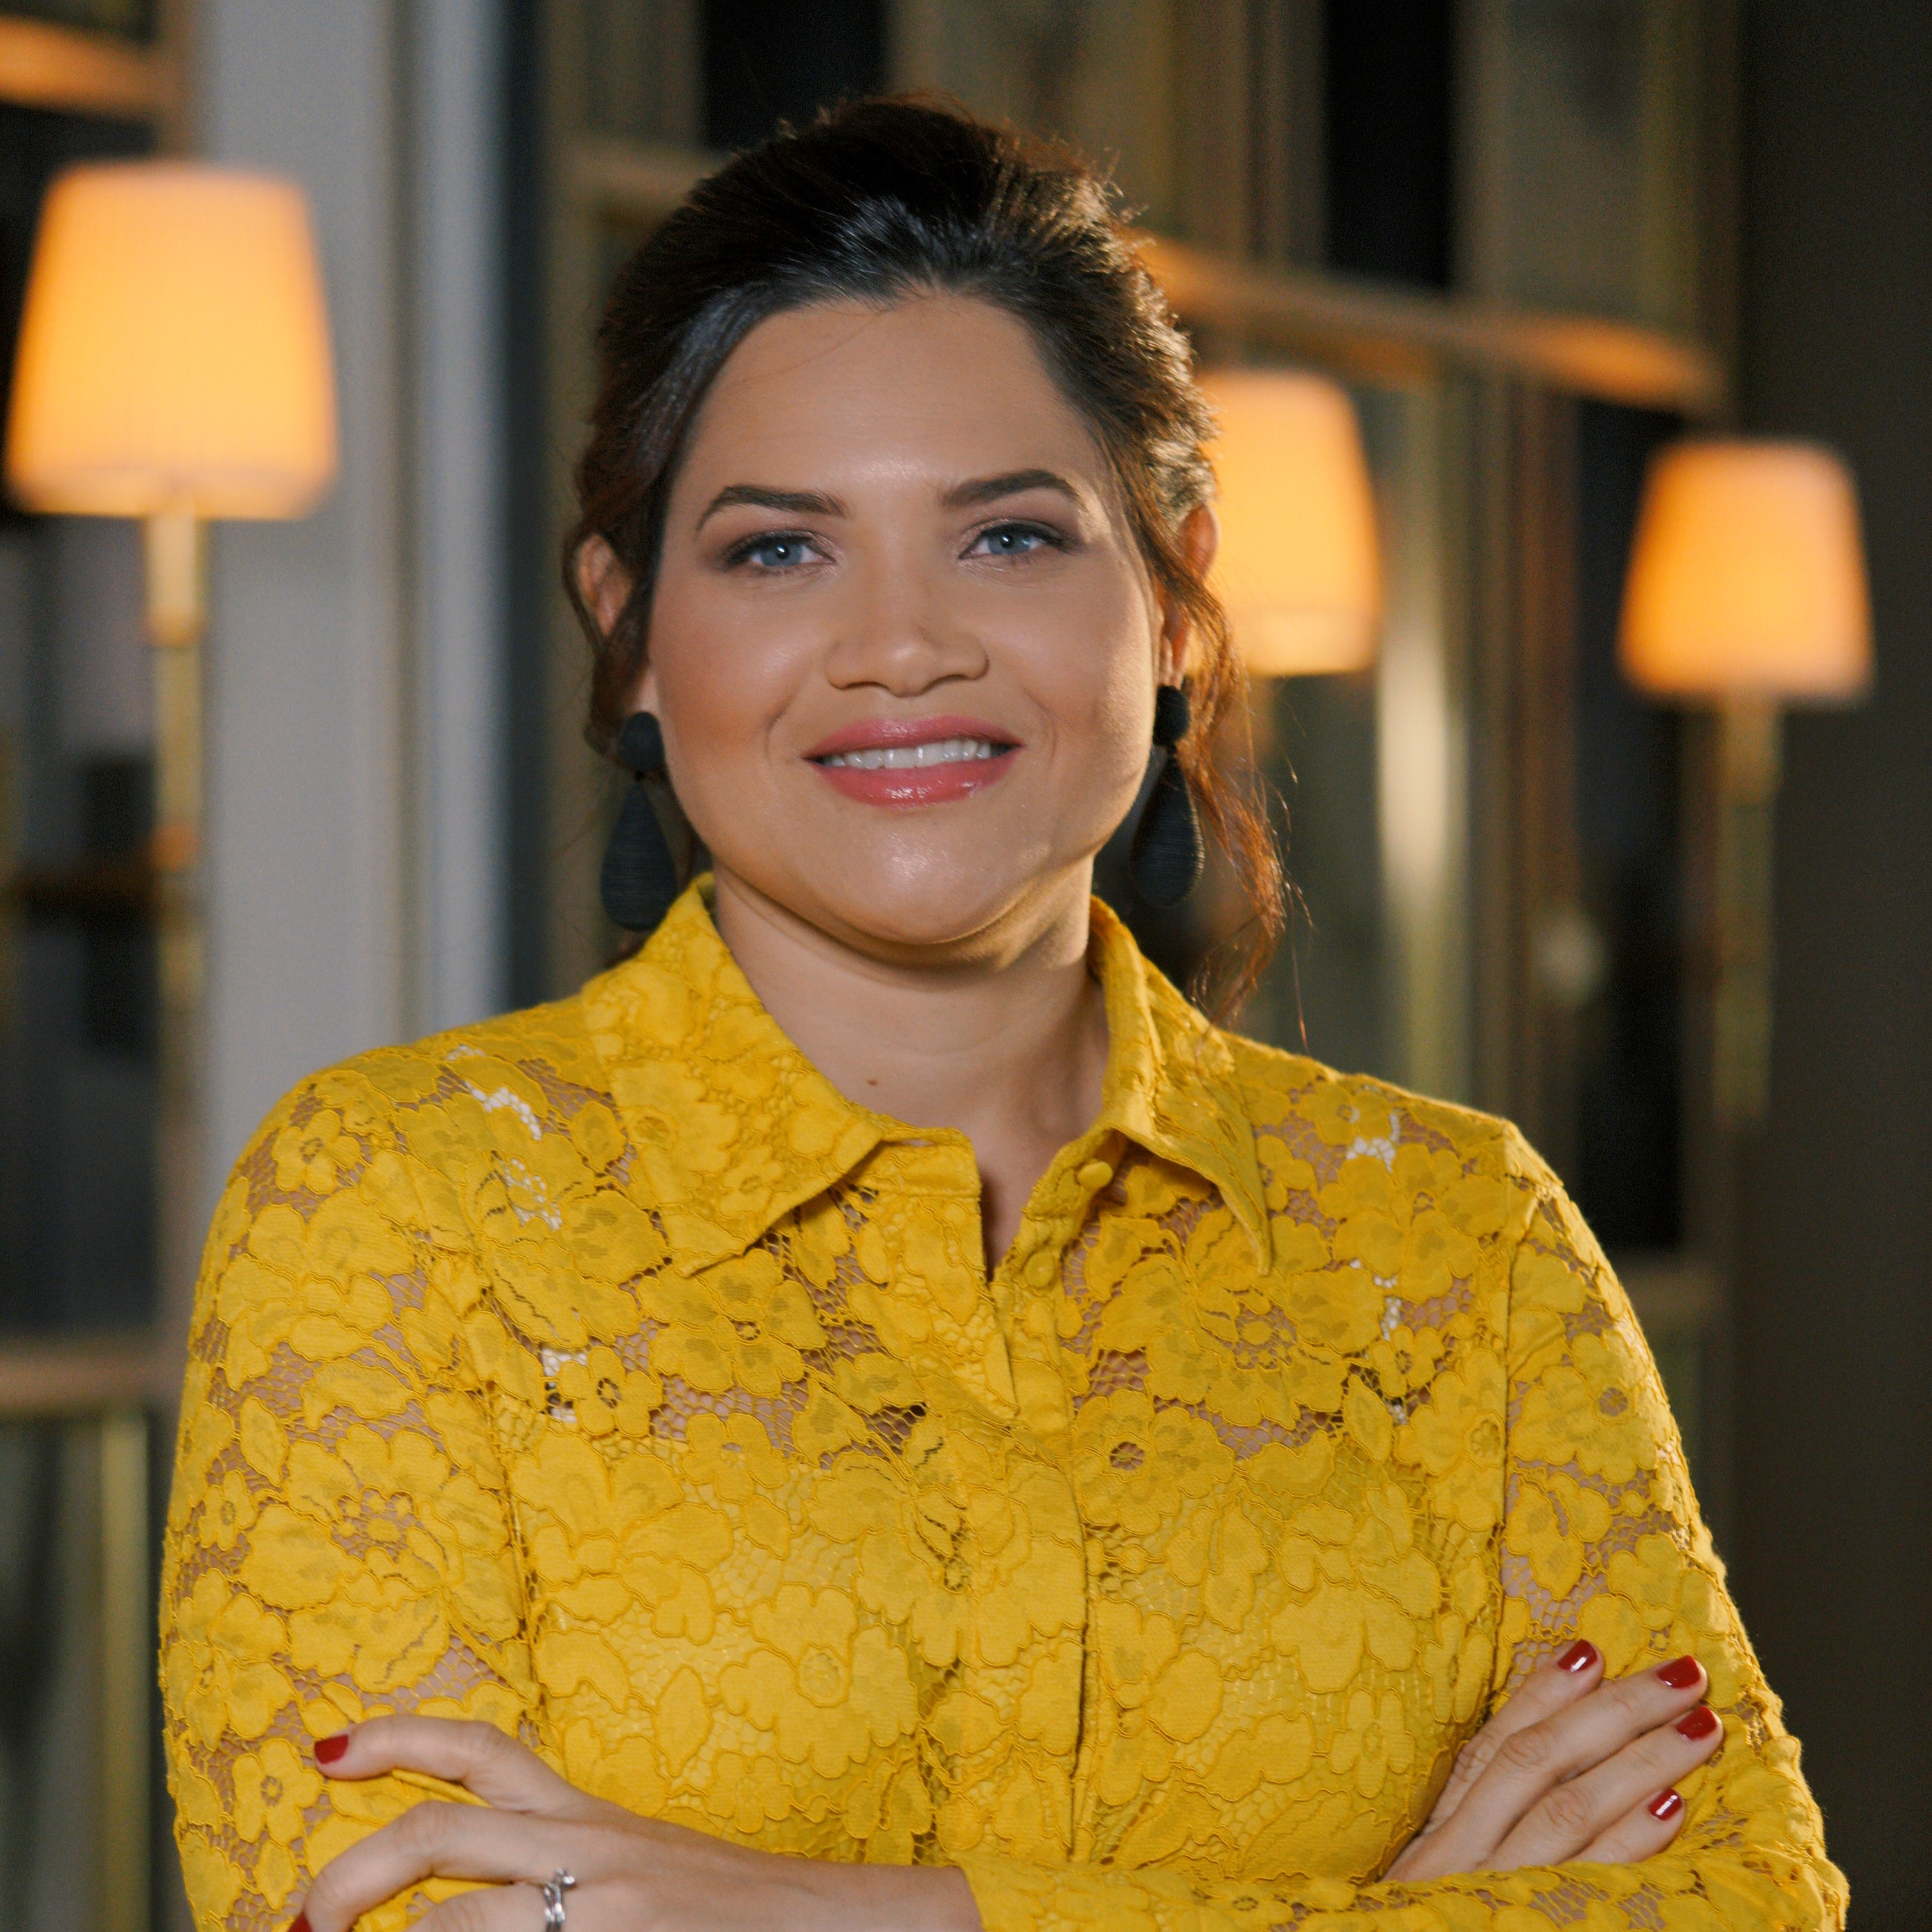 Jassil Villanueva - Maestra Ronera - Master Blender, The Edrington Group